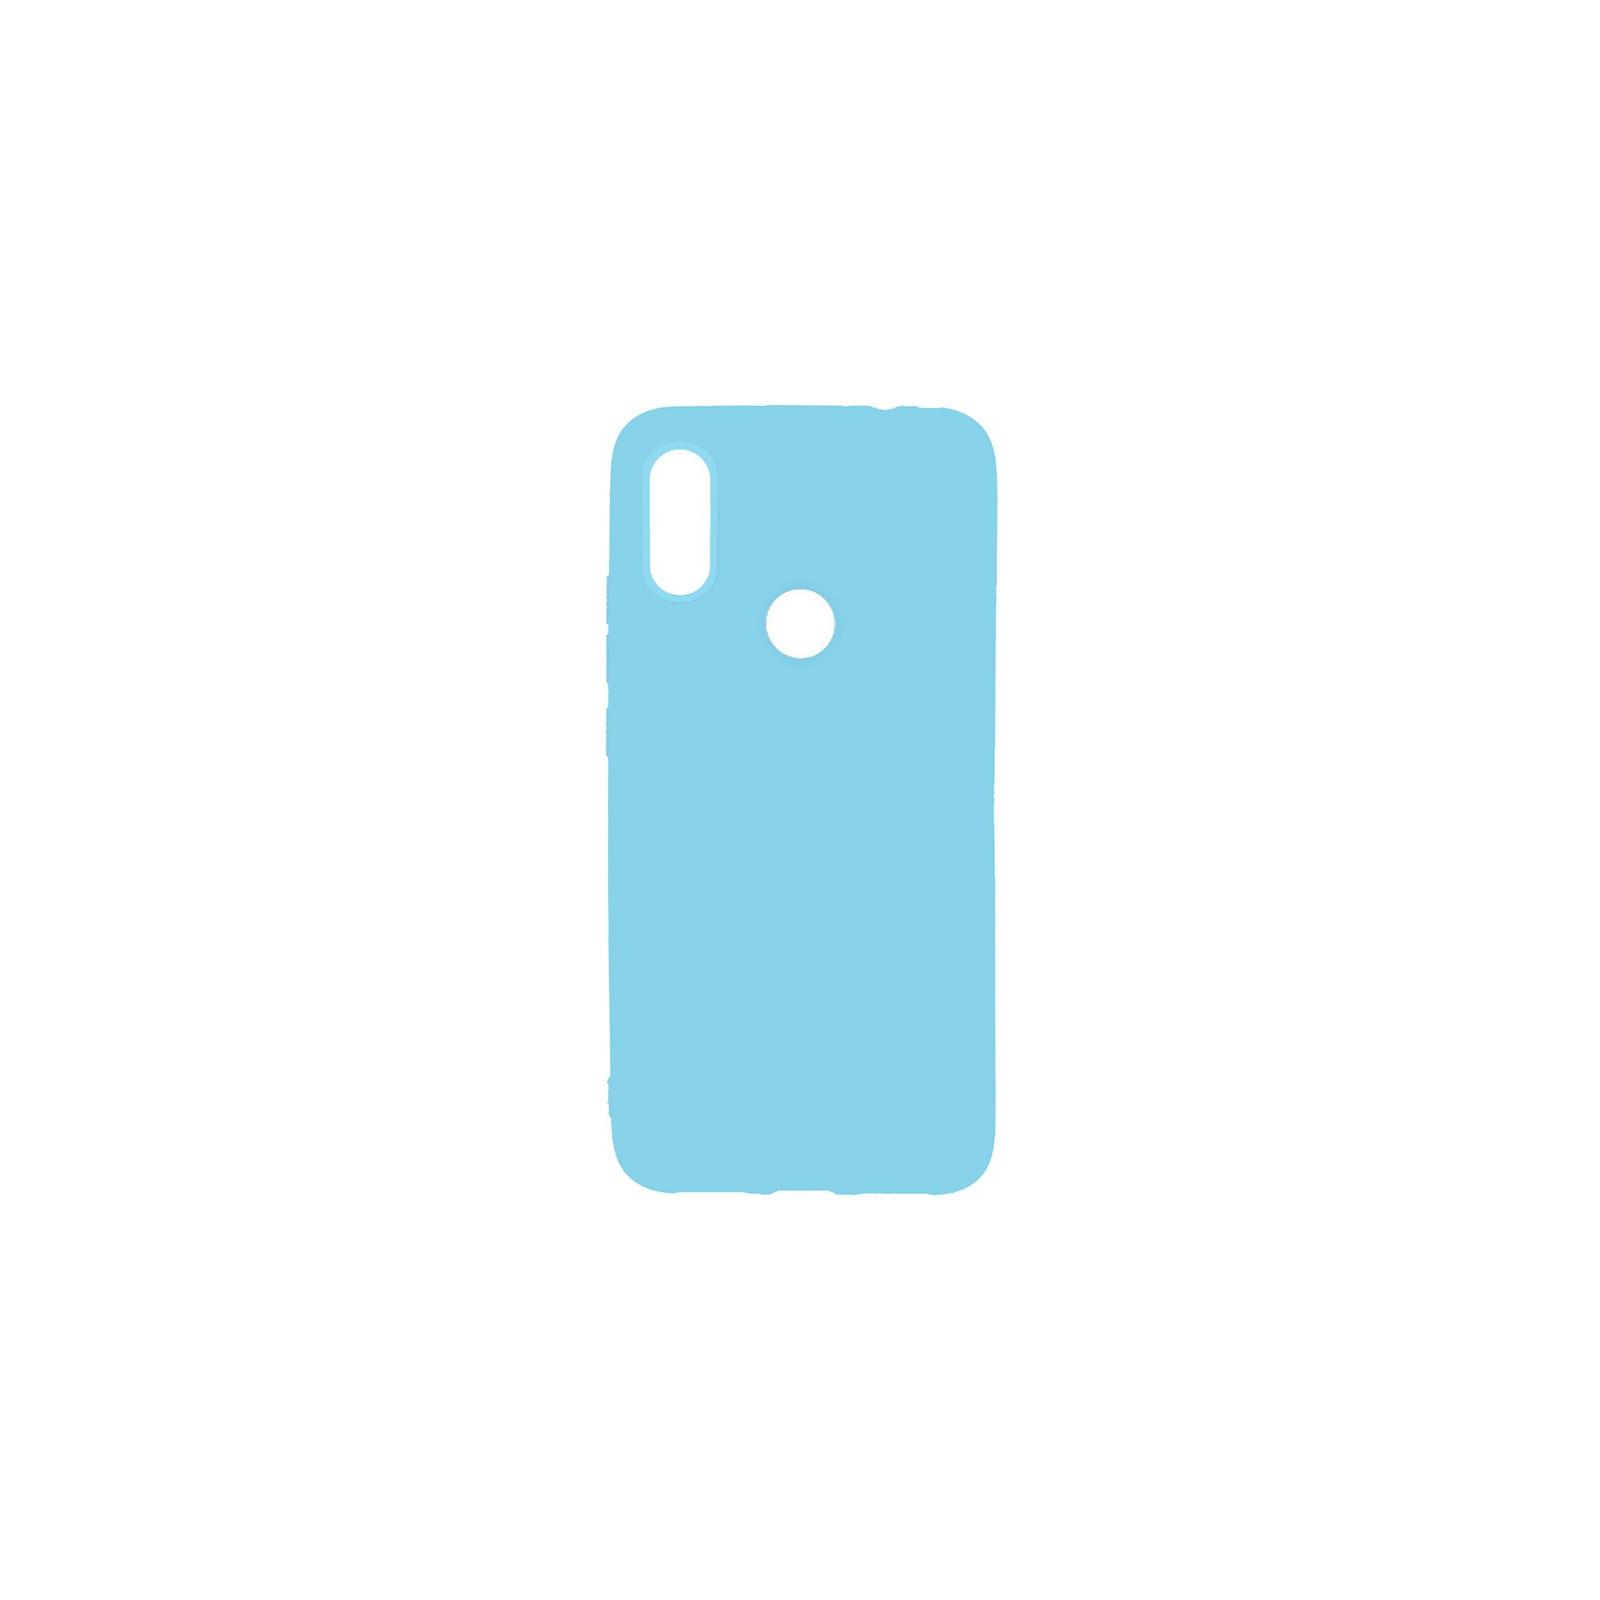 Чехол для моб. телефона Toto 1mm Matt TPU Case Xiaomi Redmi 7 Ocean Blue (F_94091)